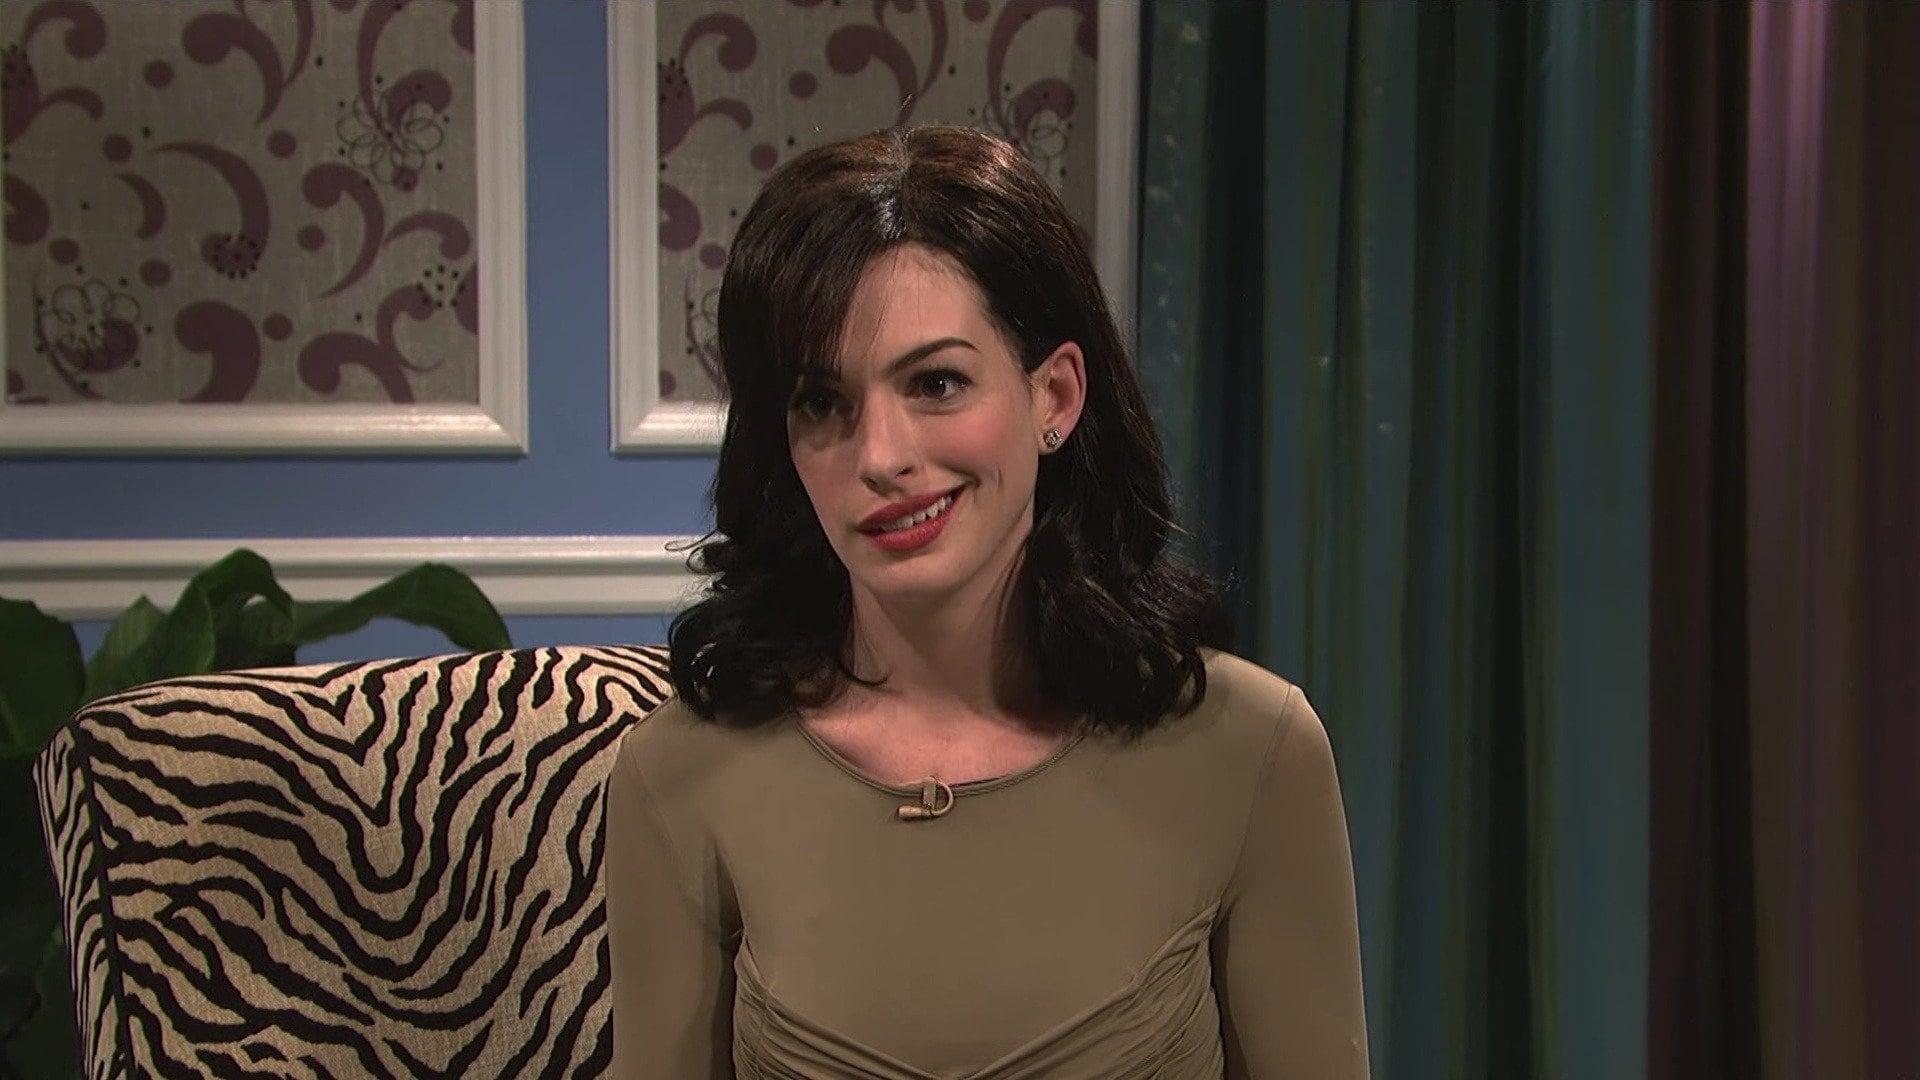 Anne Hathaway: November 20, 2010